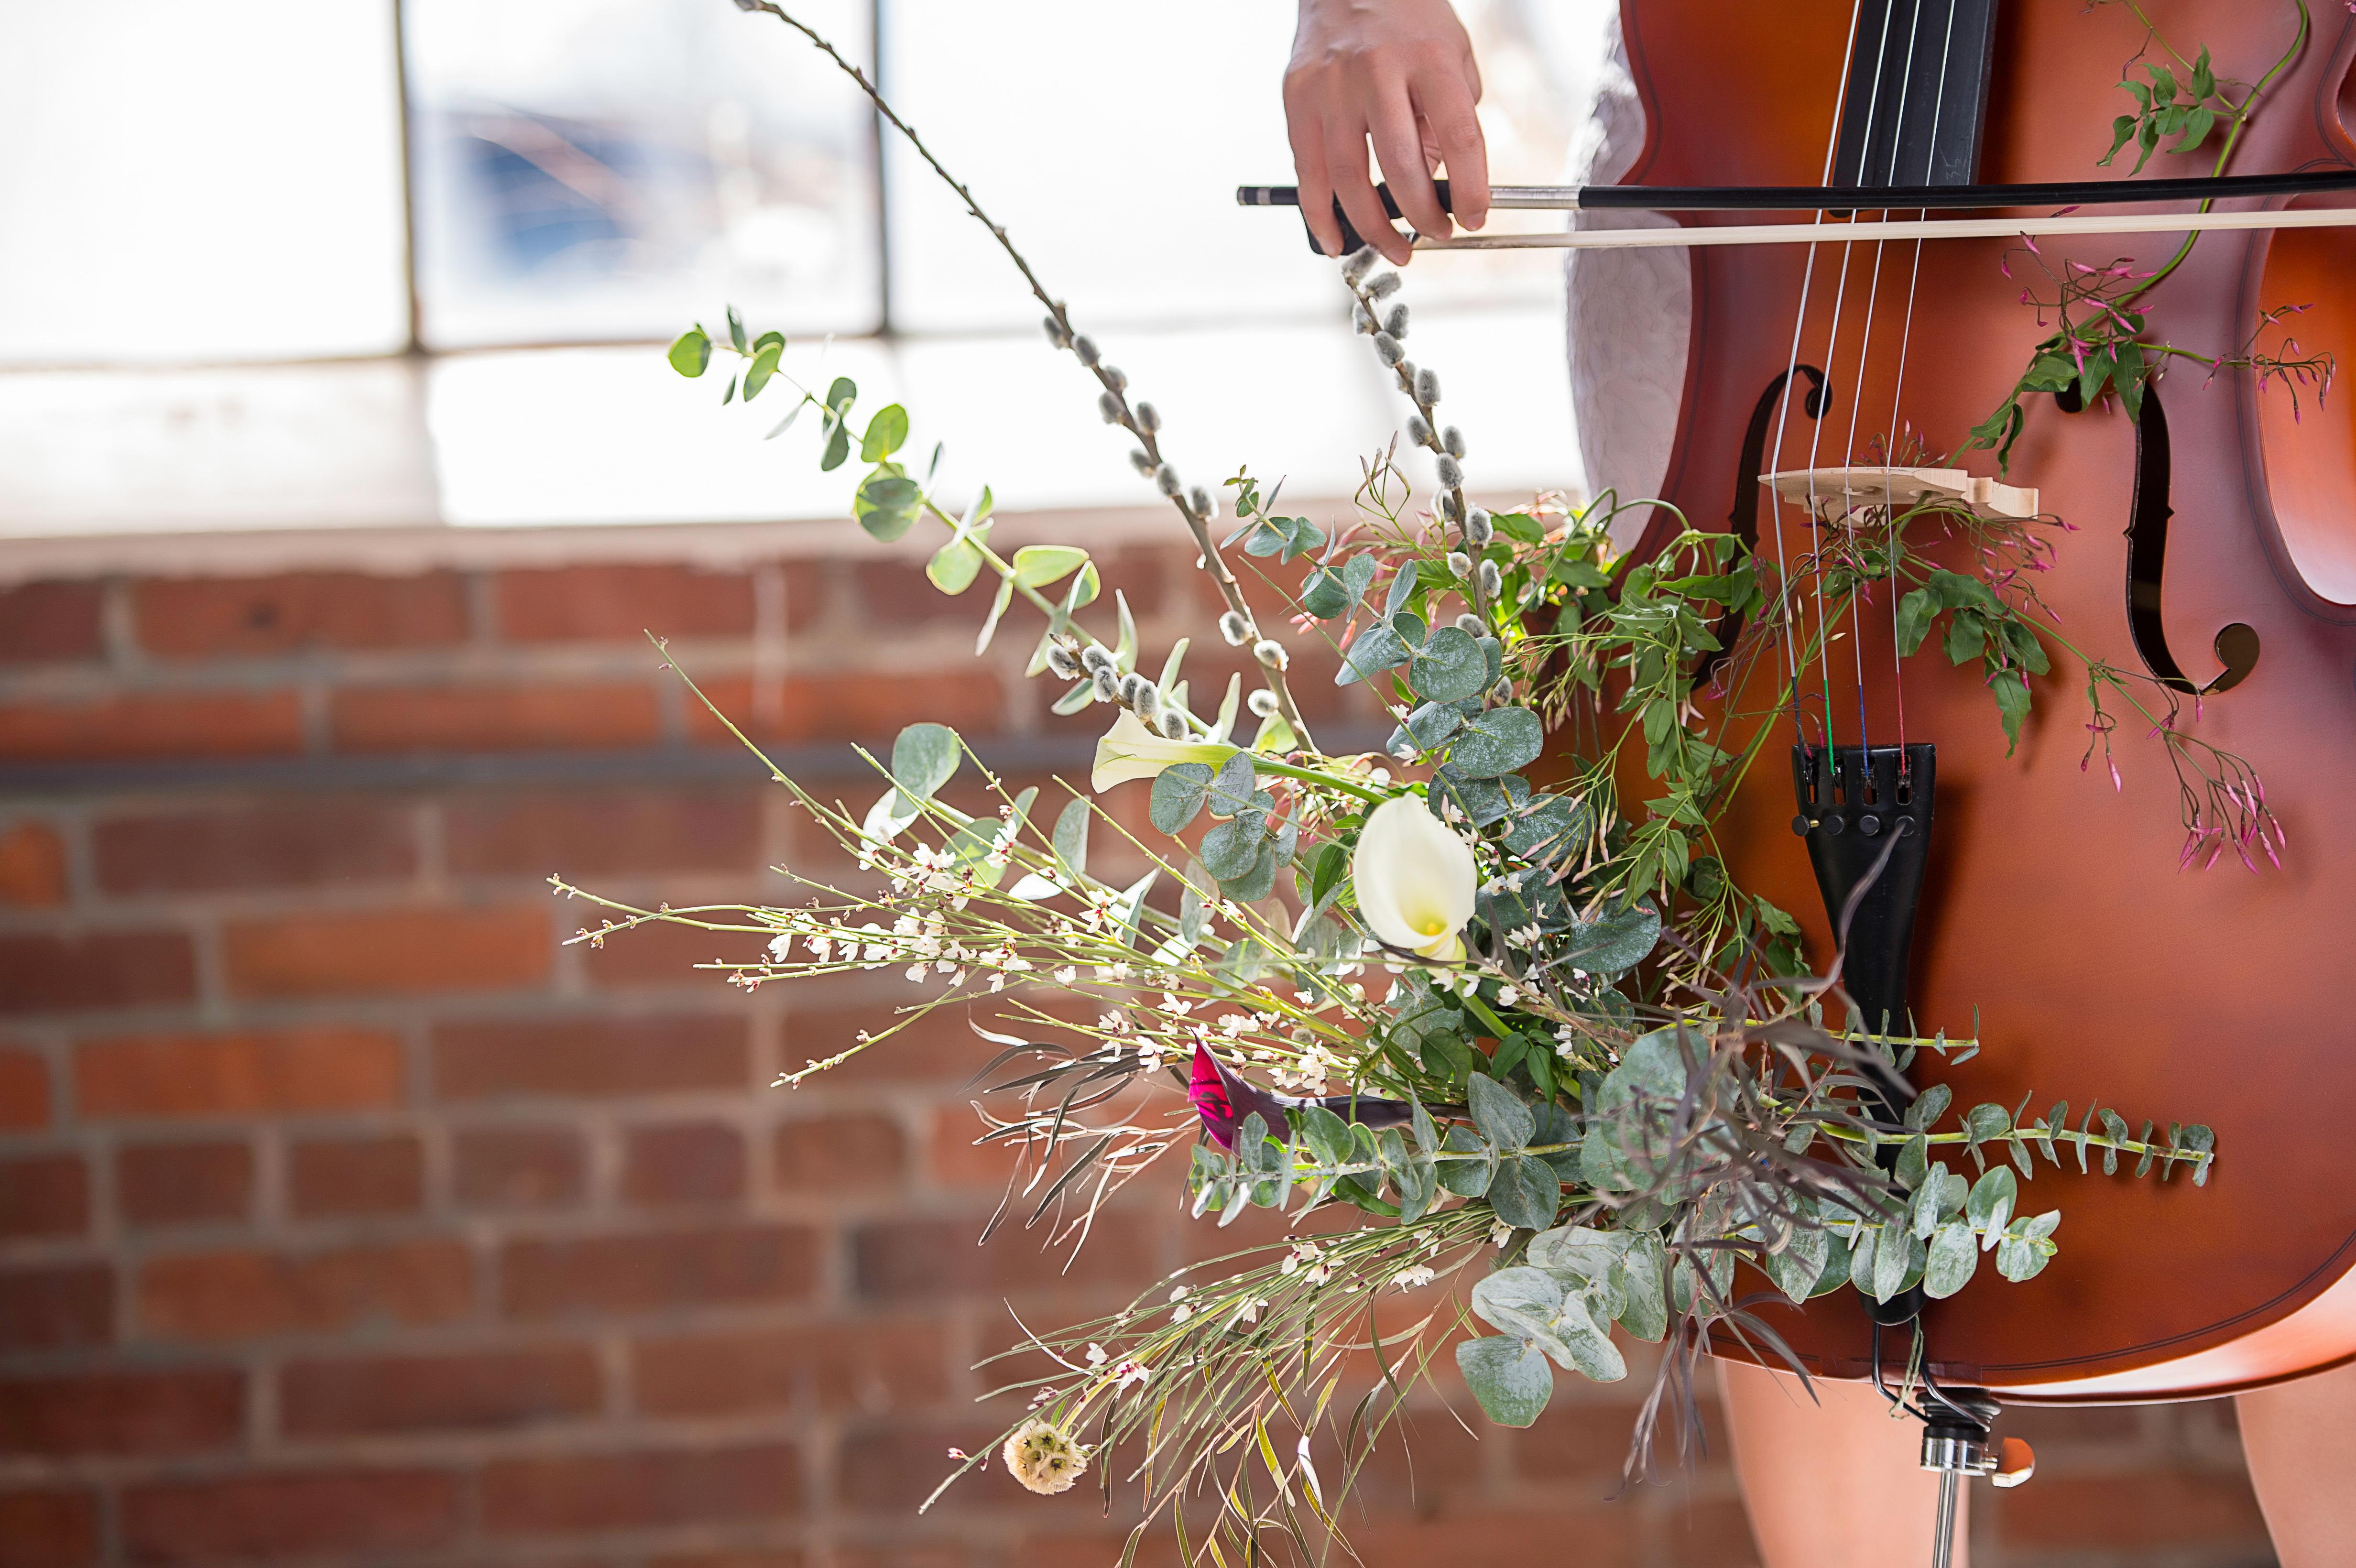 Floral Instruments